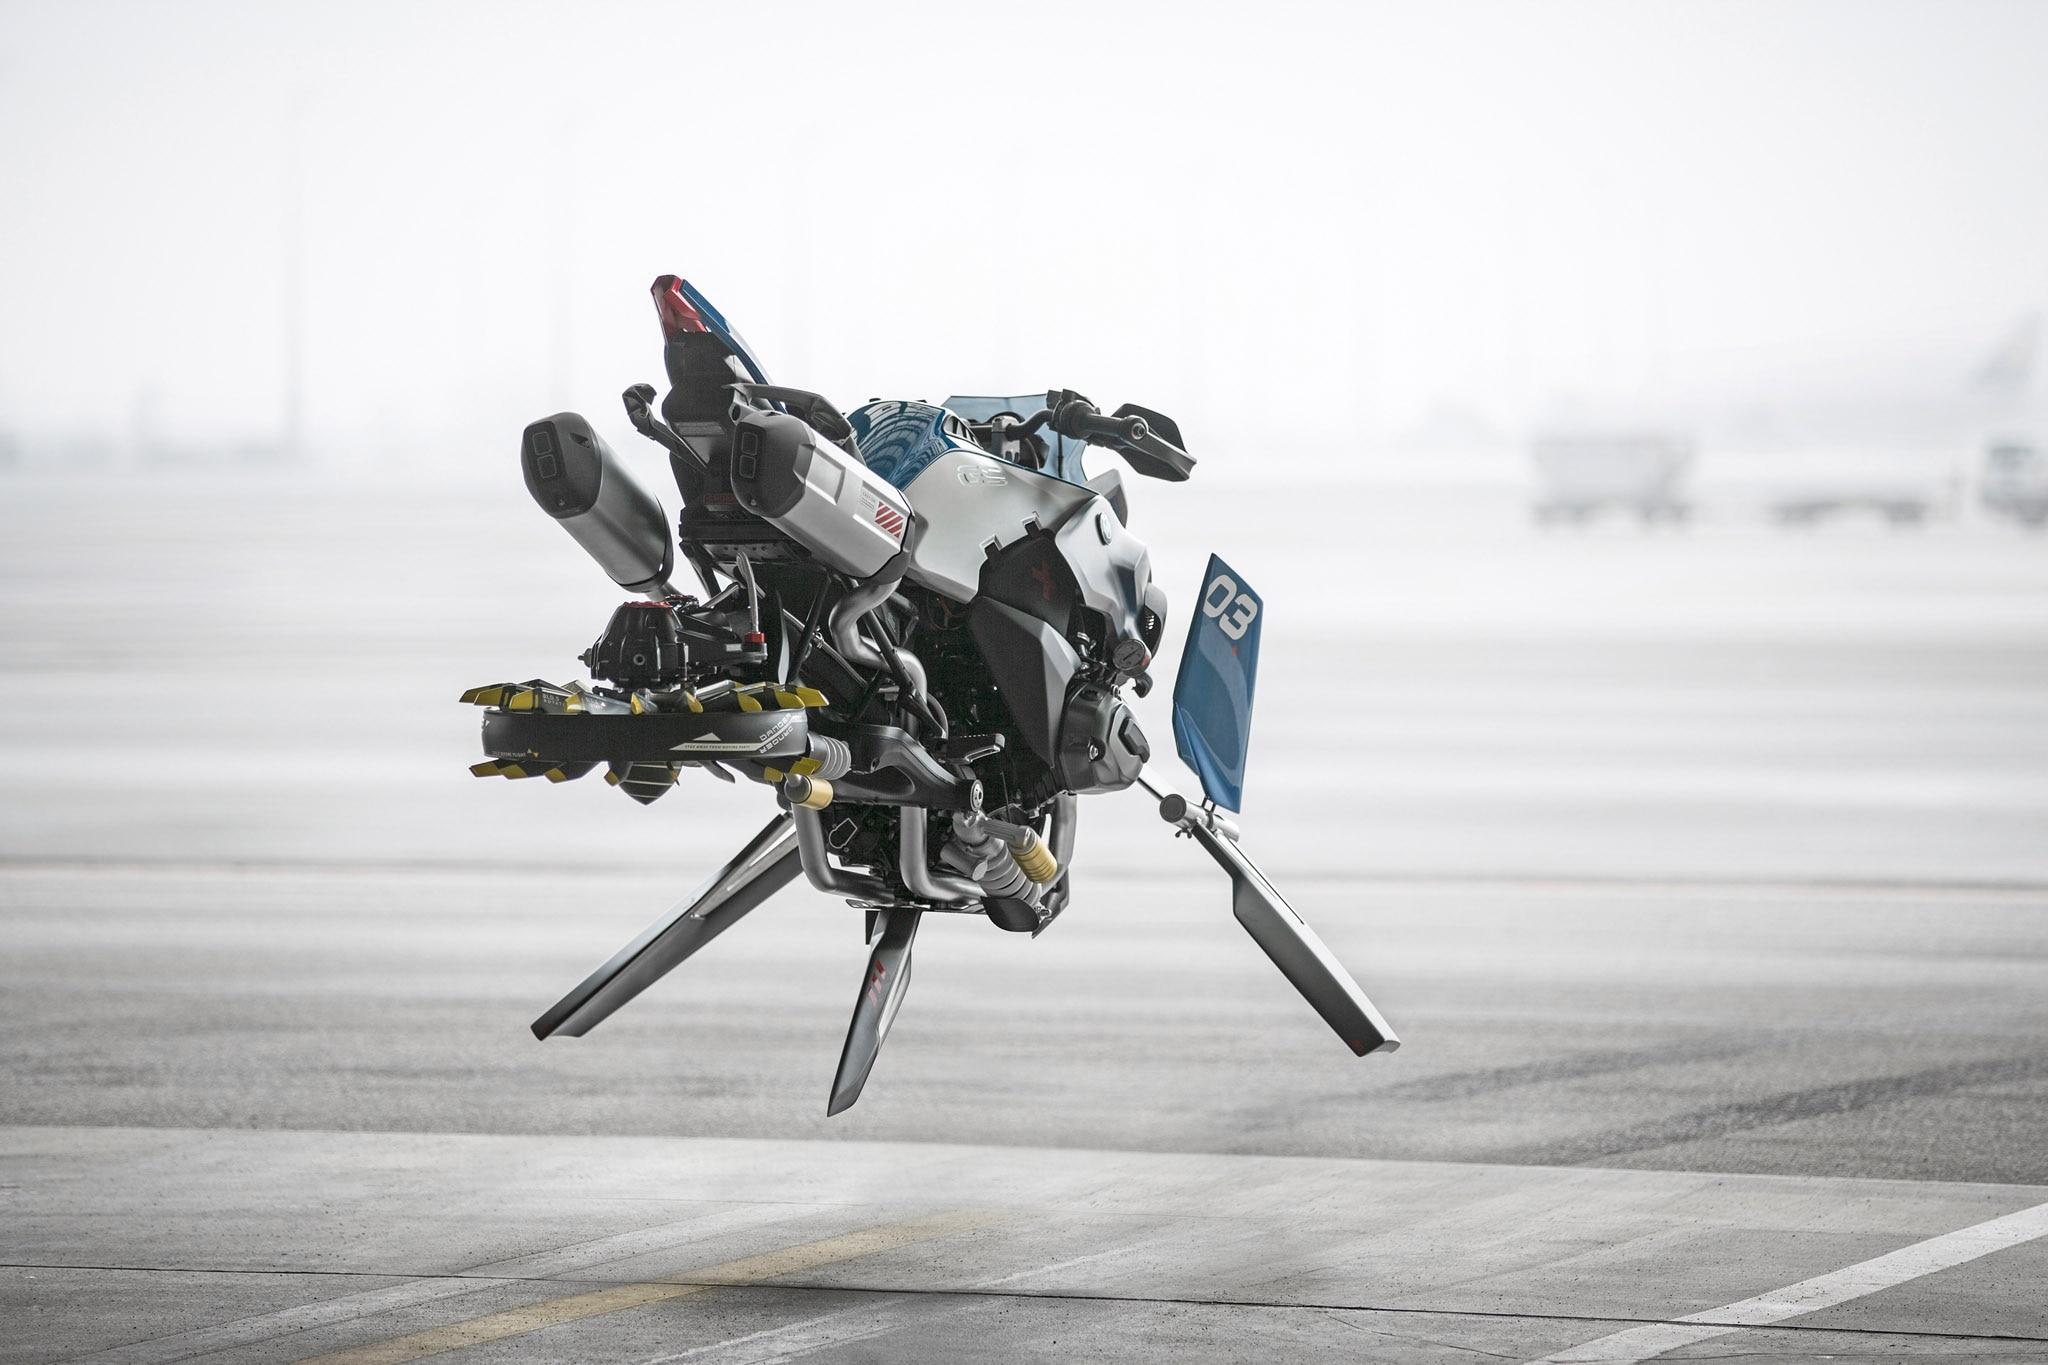 BMW Motorrad And LEGO Technic Hover Ride Design Concept In Flight